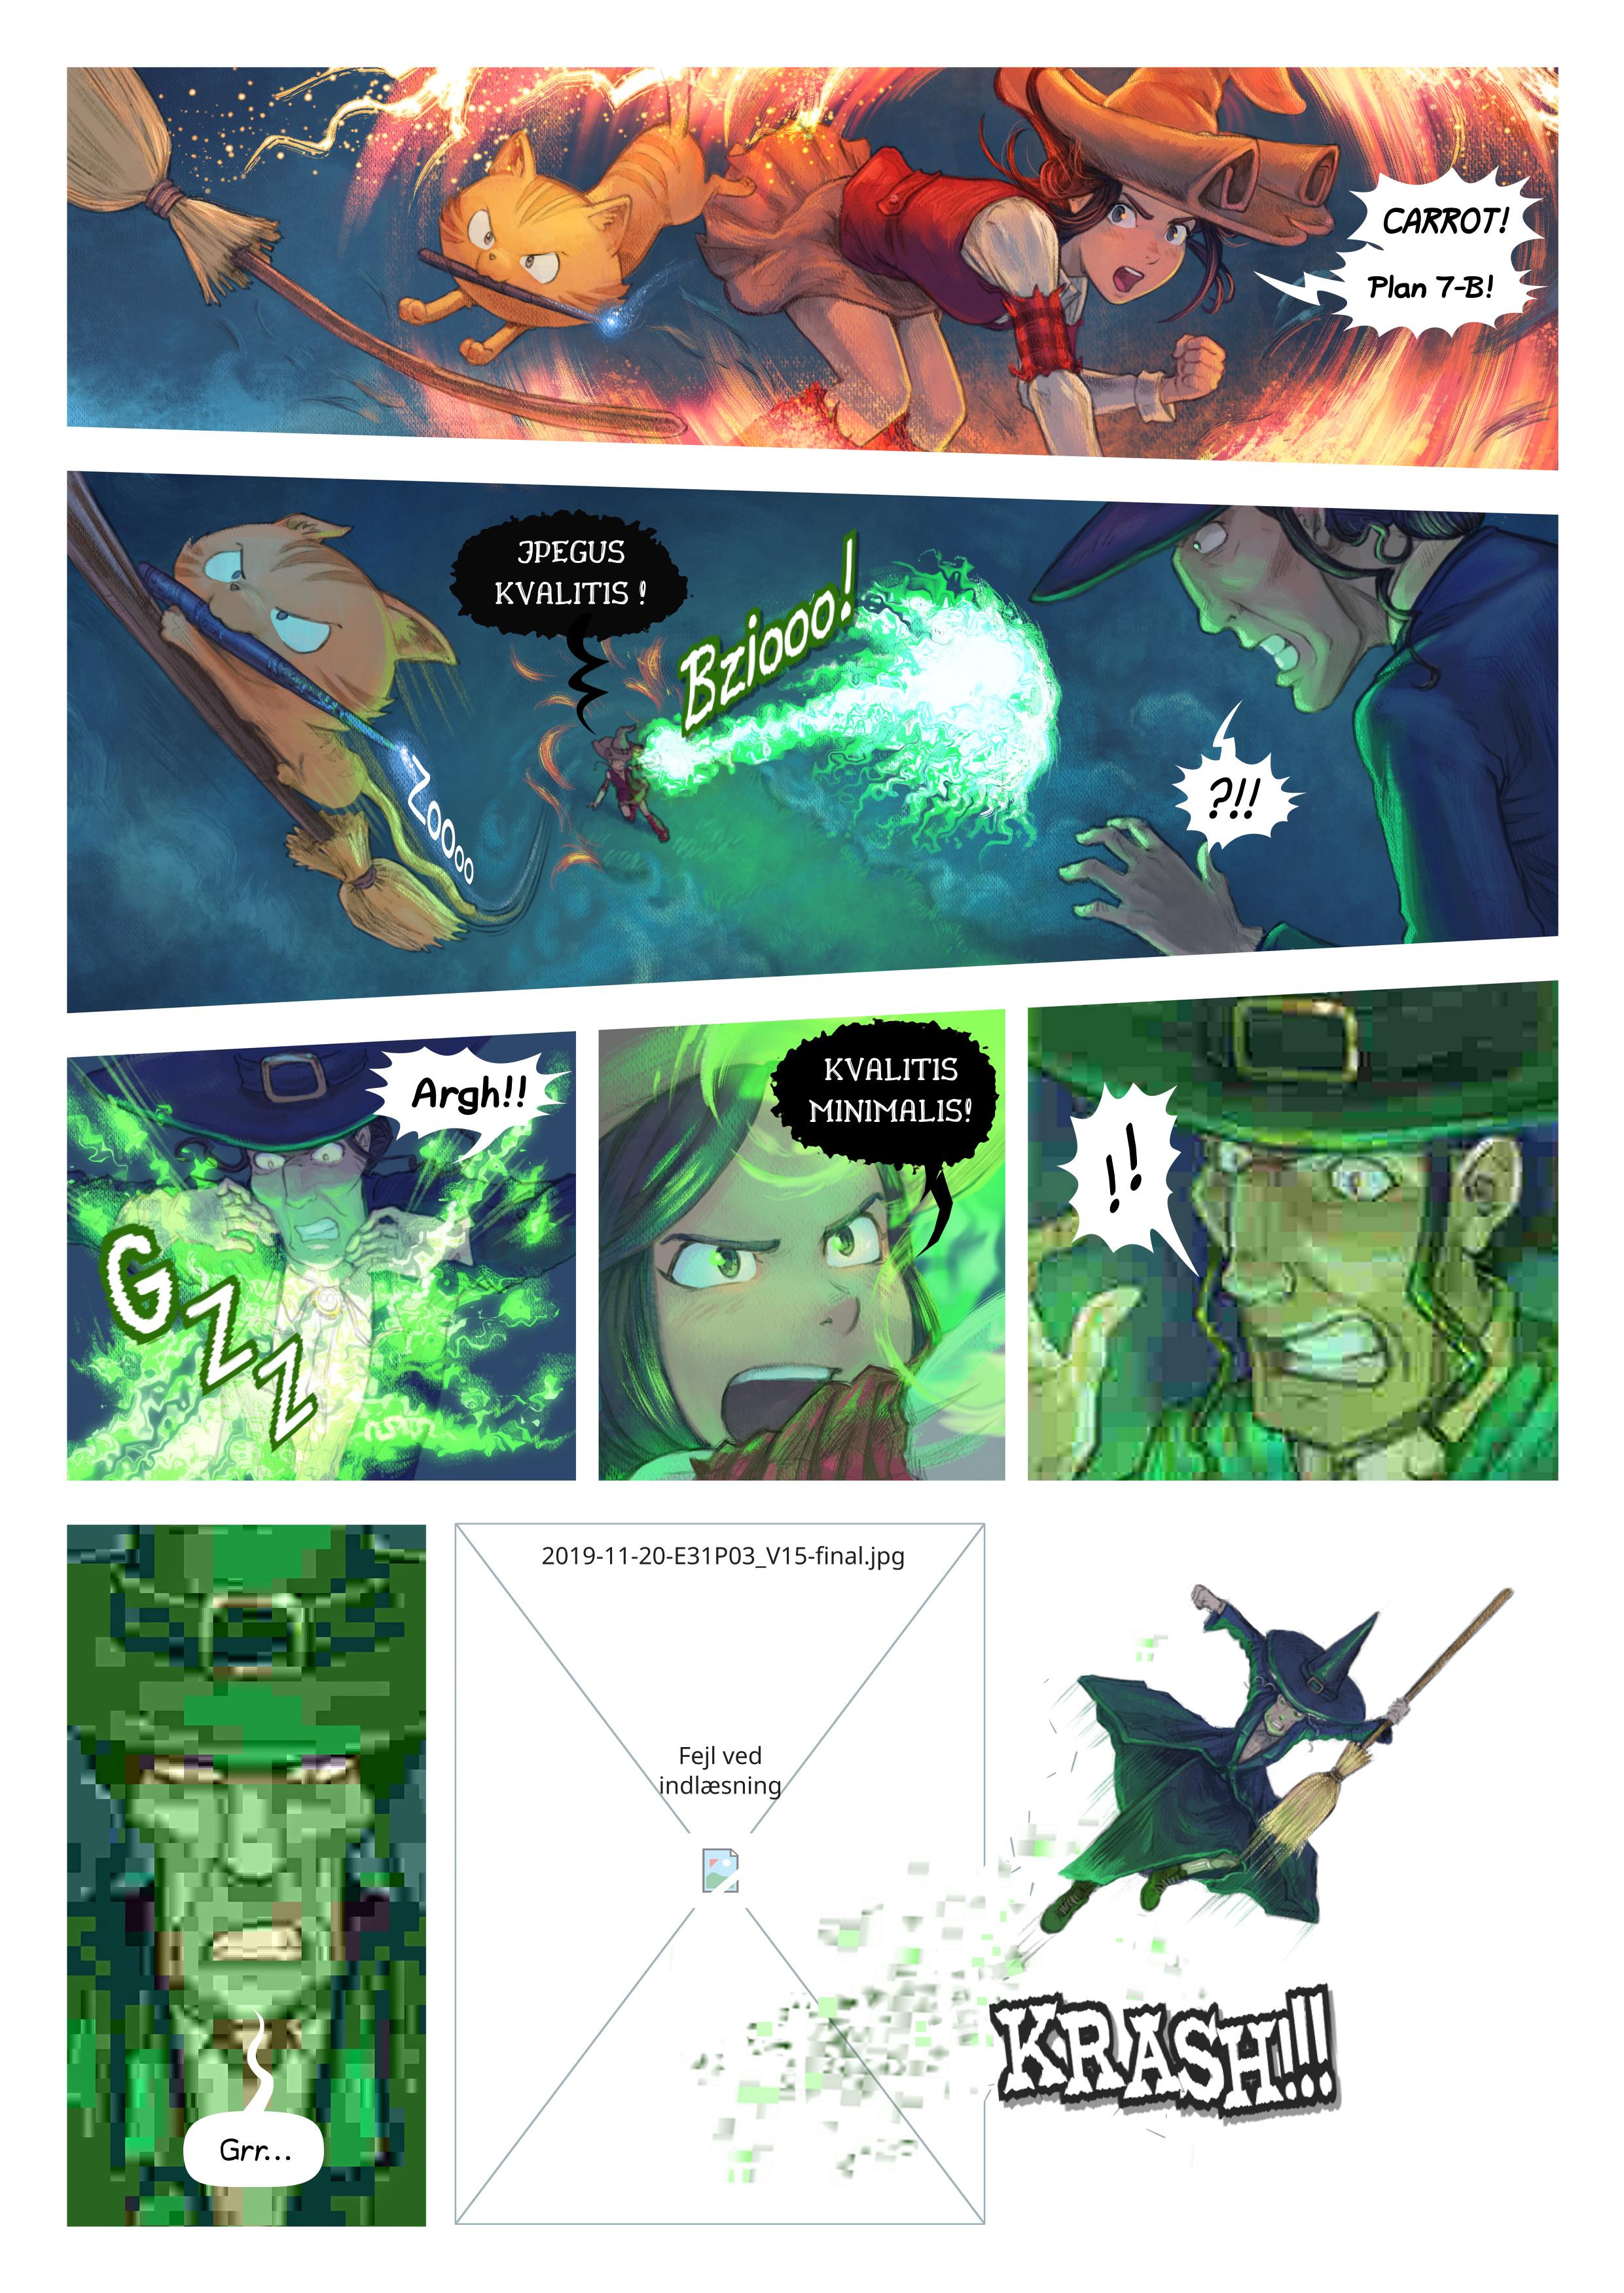 Episode 31: Kampen, Page 3